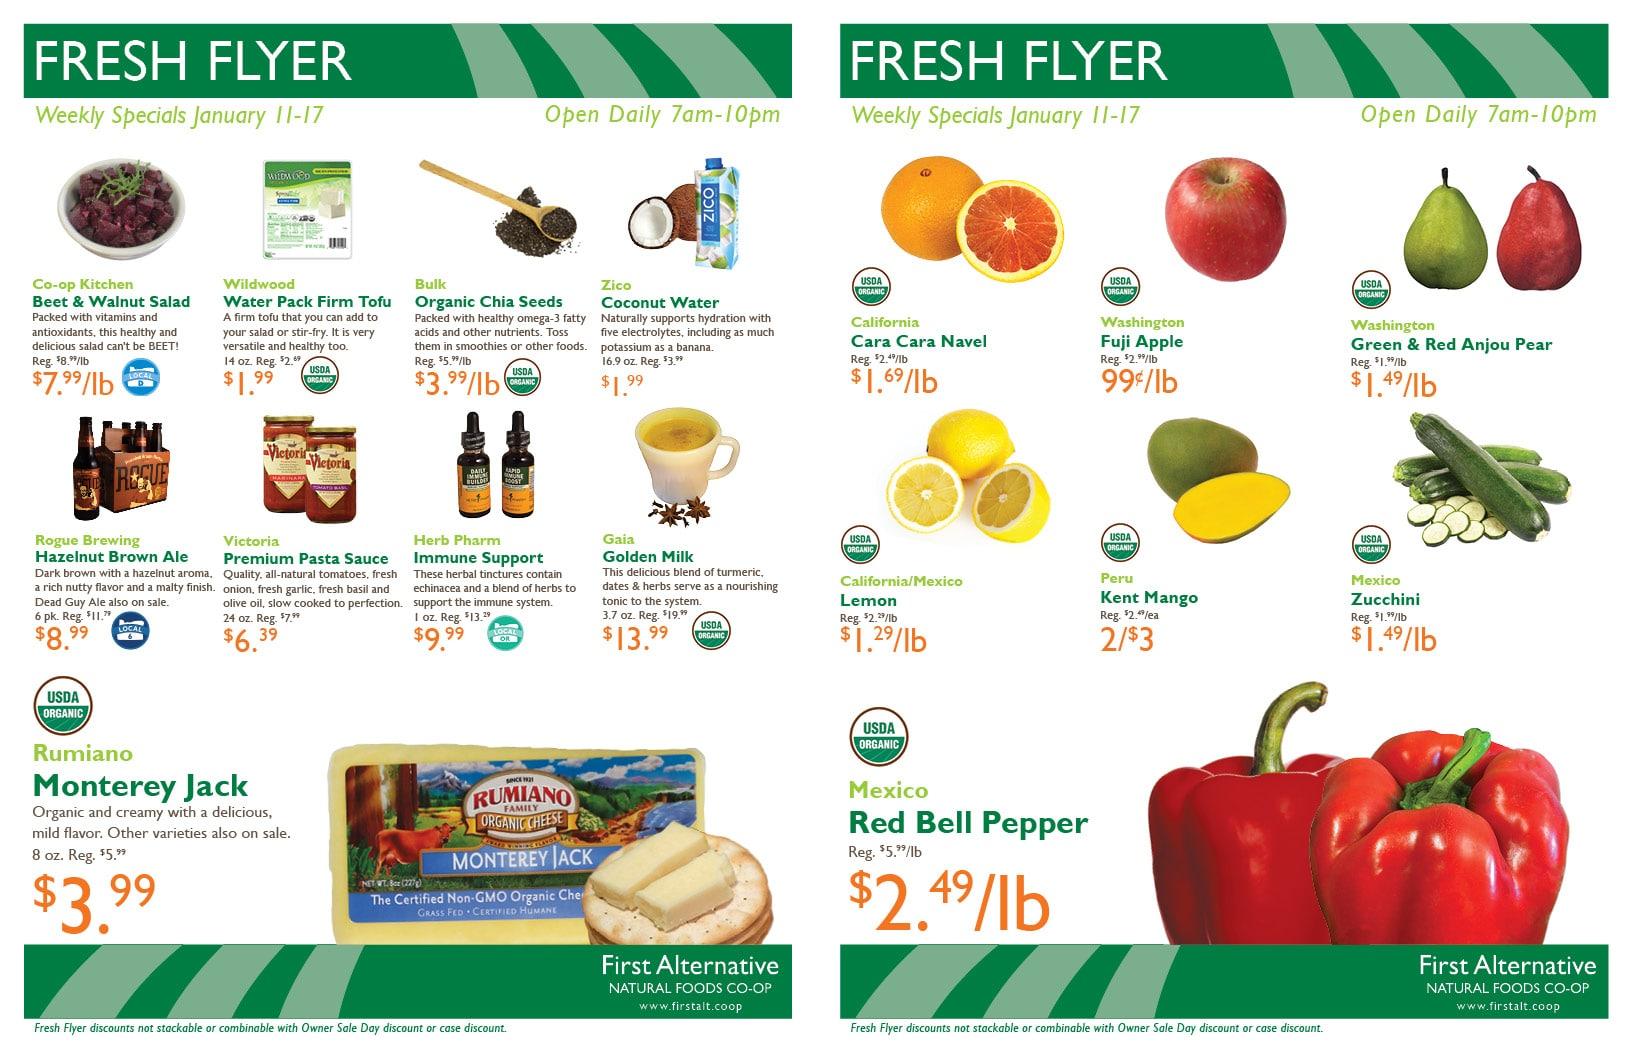 First Alternative Co-op Fresh Flyer Jan. 11-17